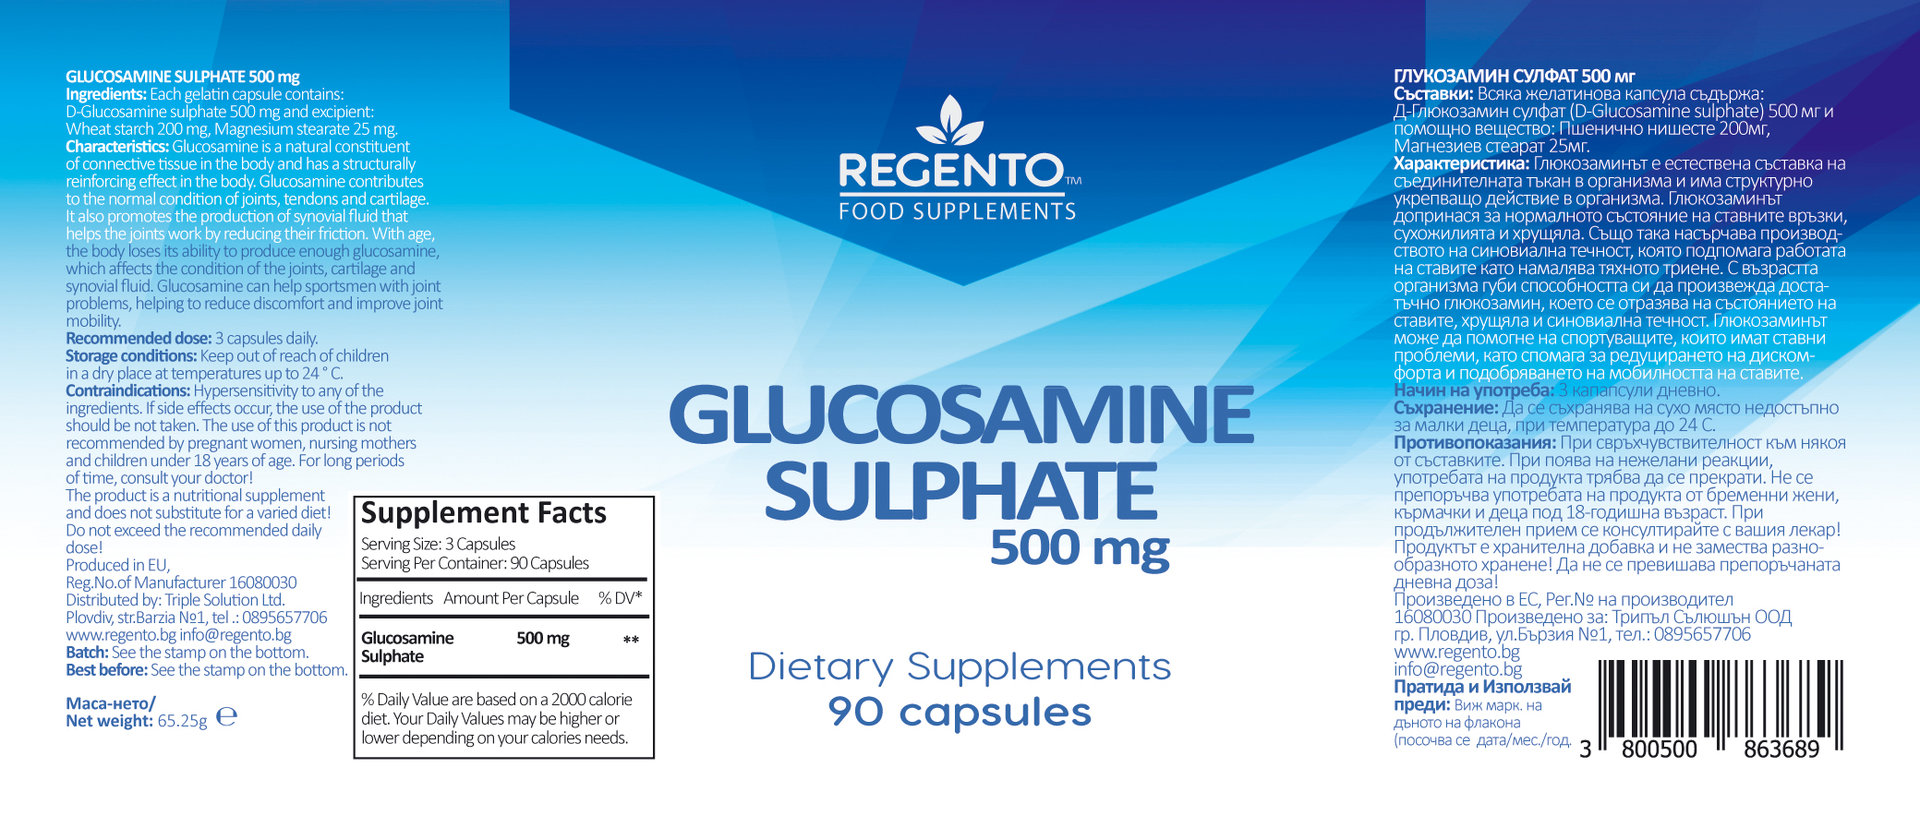 REGENTO GLYCOSAMIN SULPHATE 500mg 90 capsules